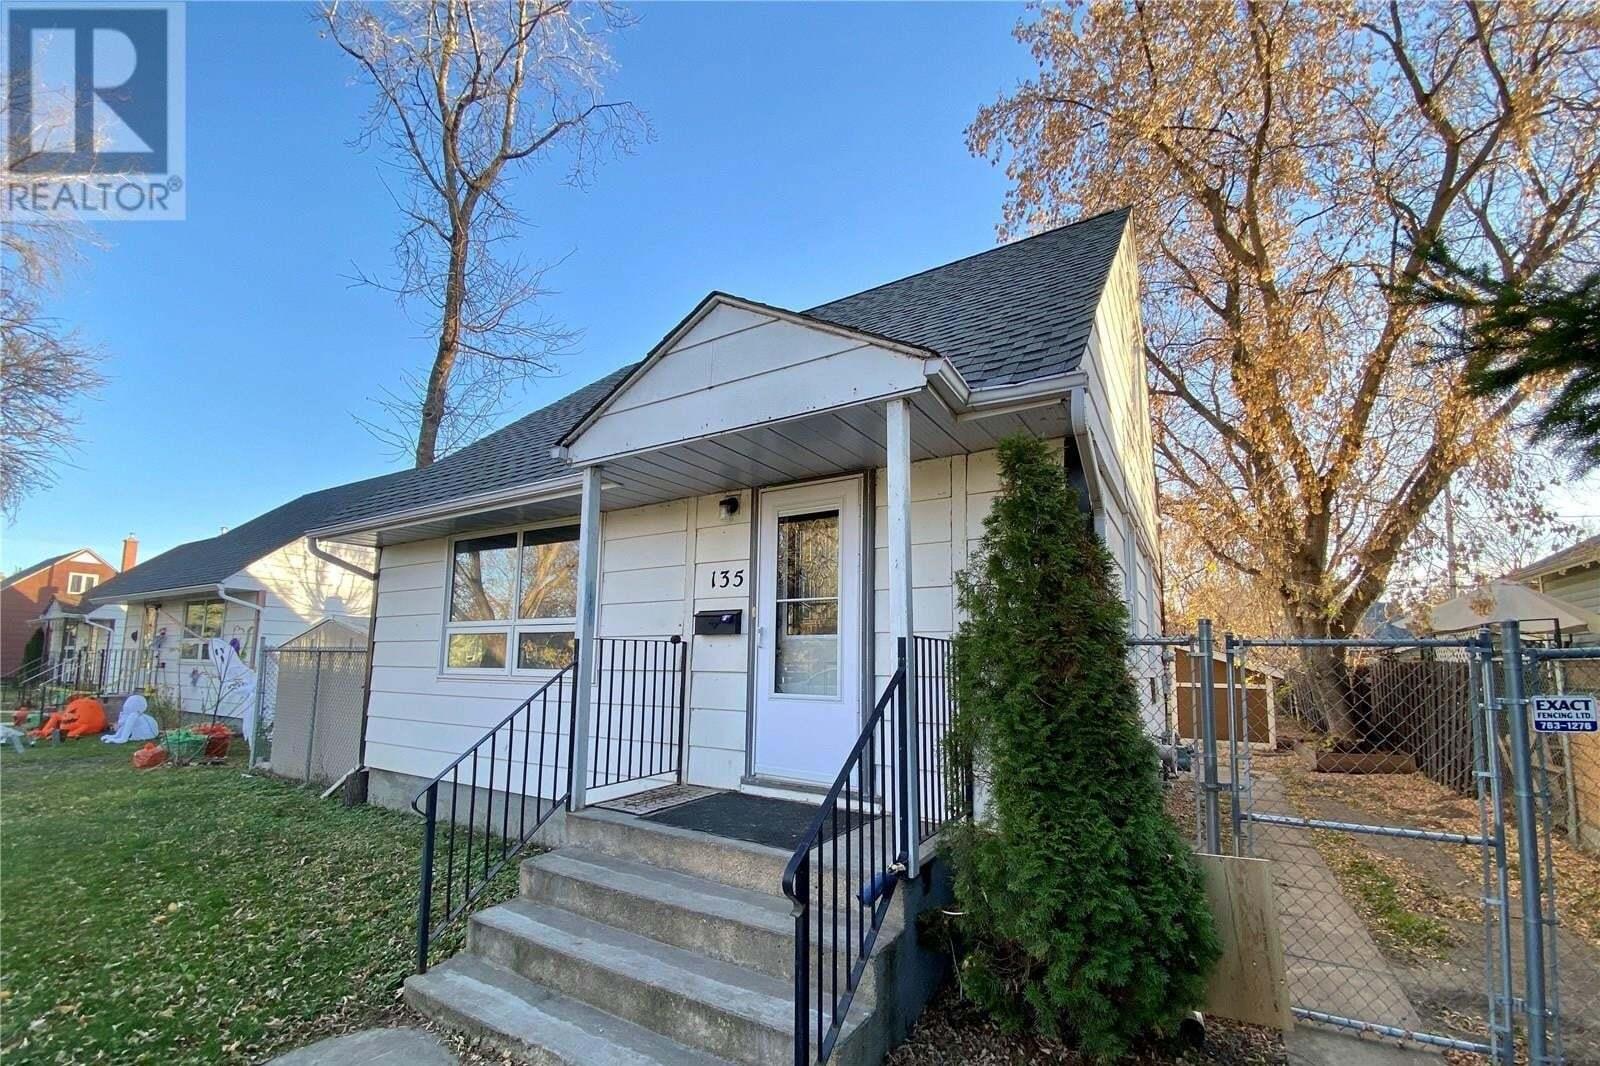 House for sale at 135 23rd St E Prince Albert Saskatchewan - MLS: SK830458